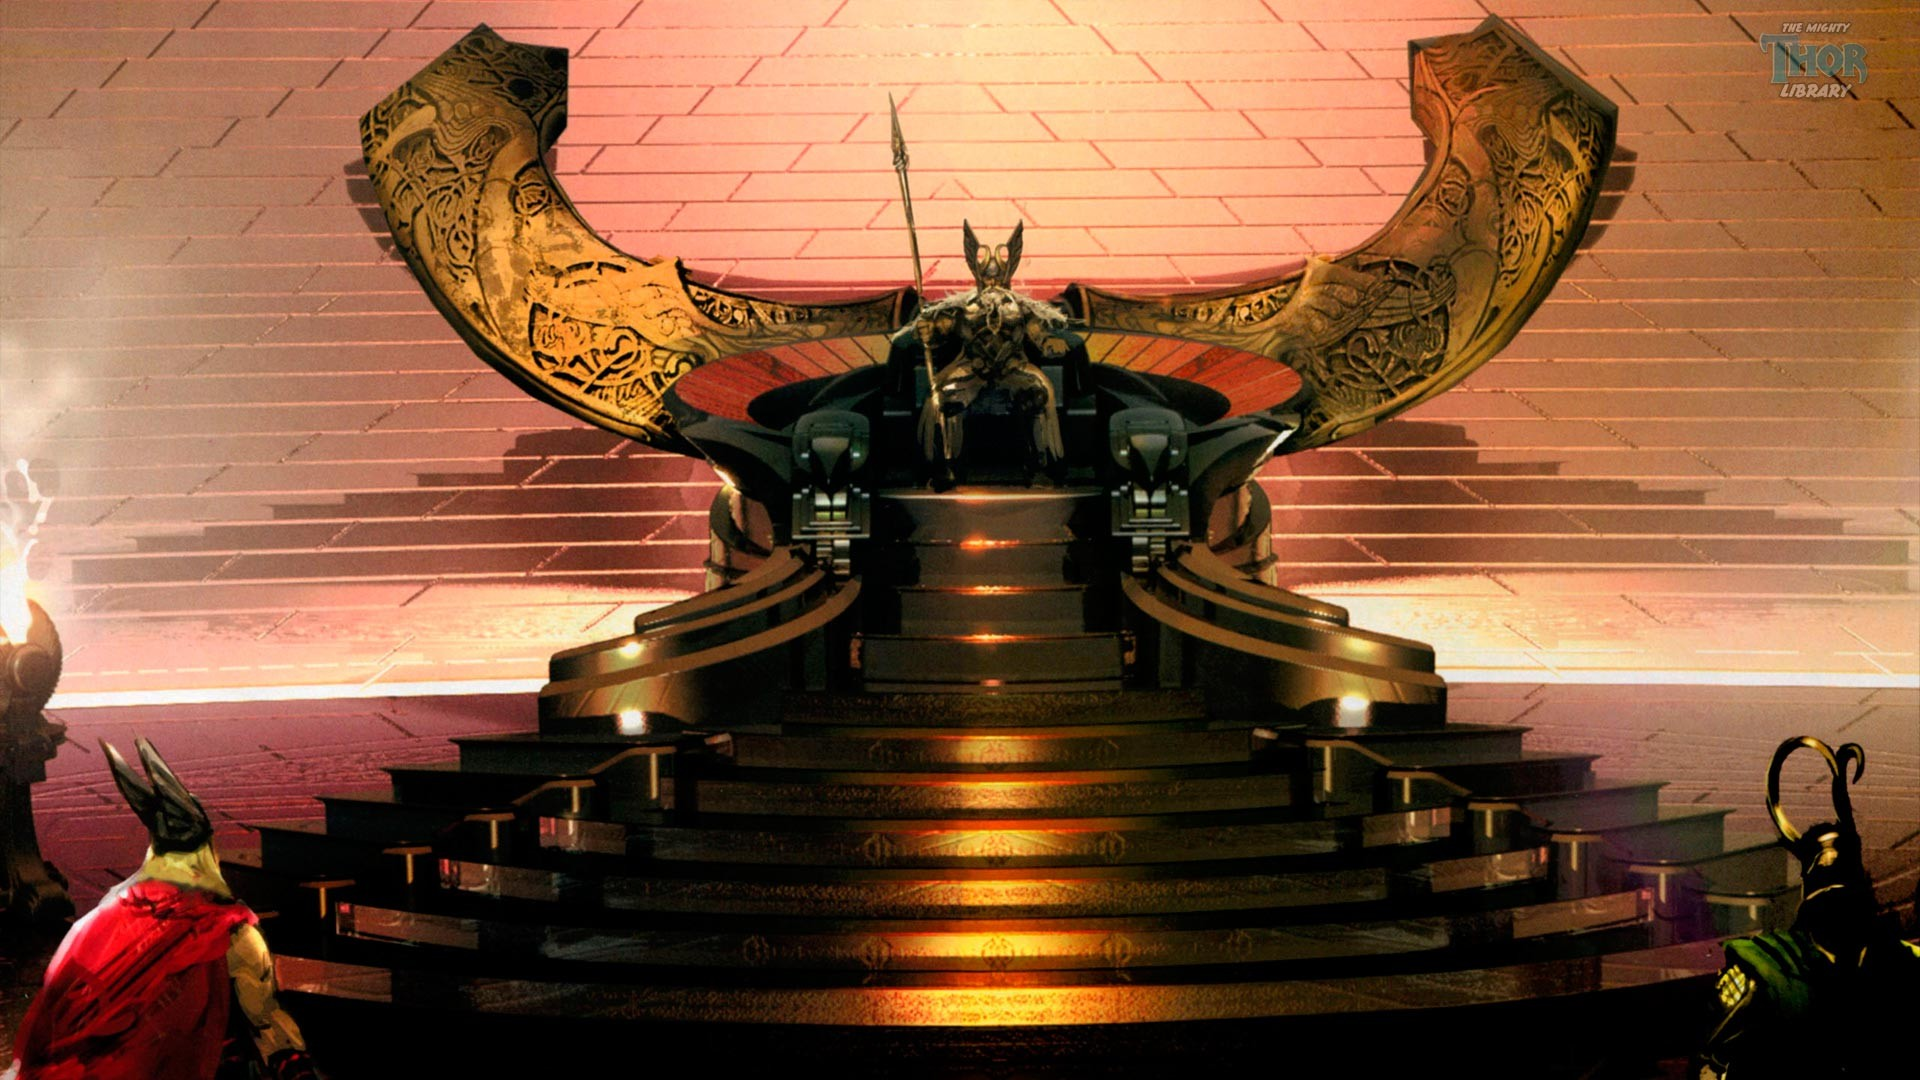 King throne background wallpapertag - King wallpaper ...